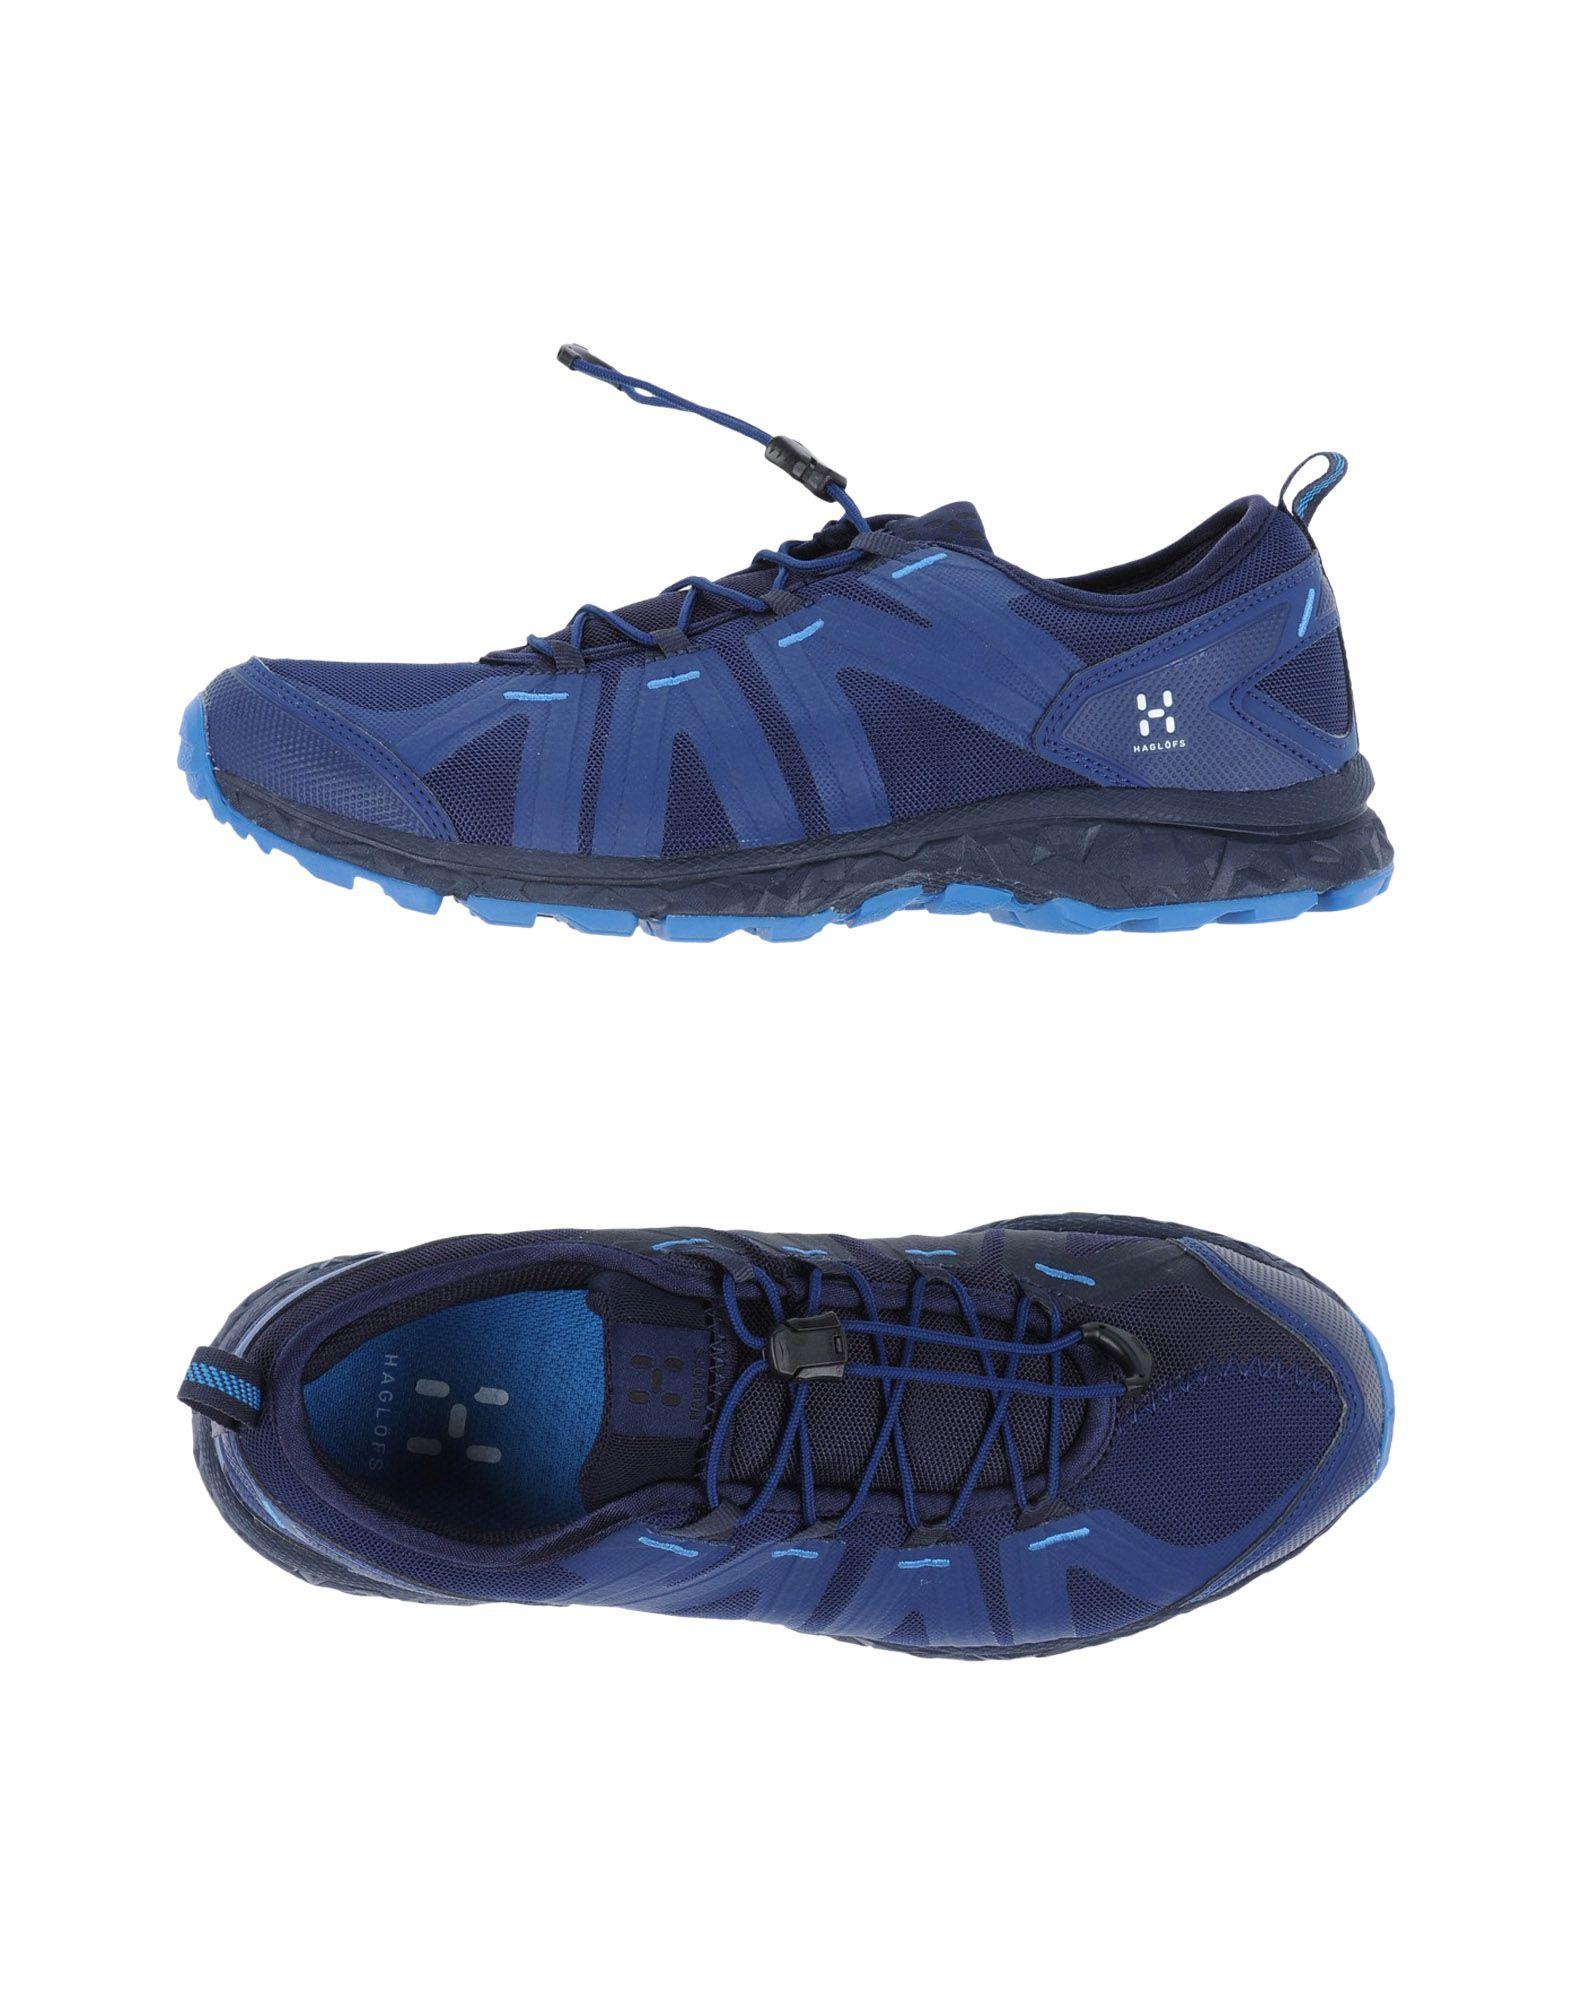 Sneakers Haglöfs Homme - Sneakers Haglöfs sur